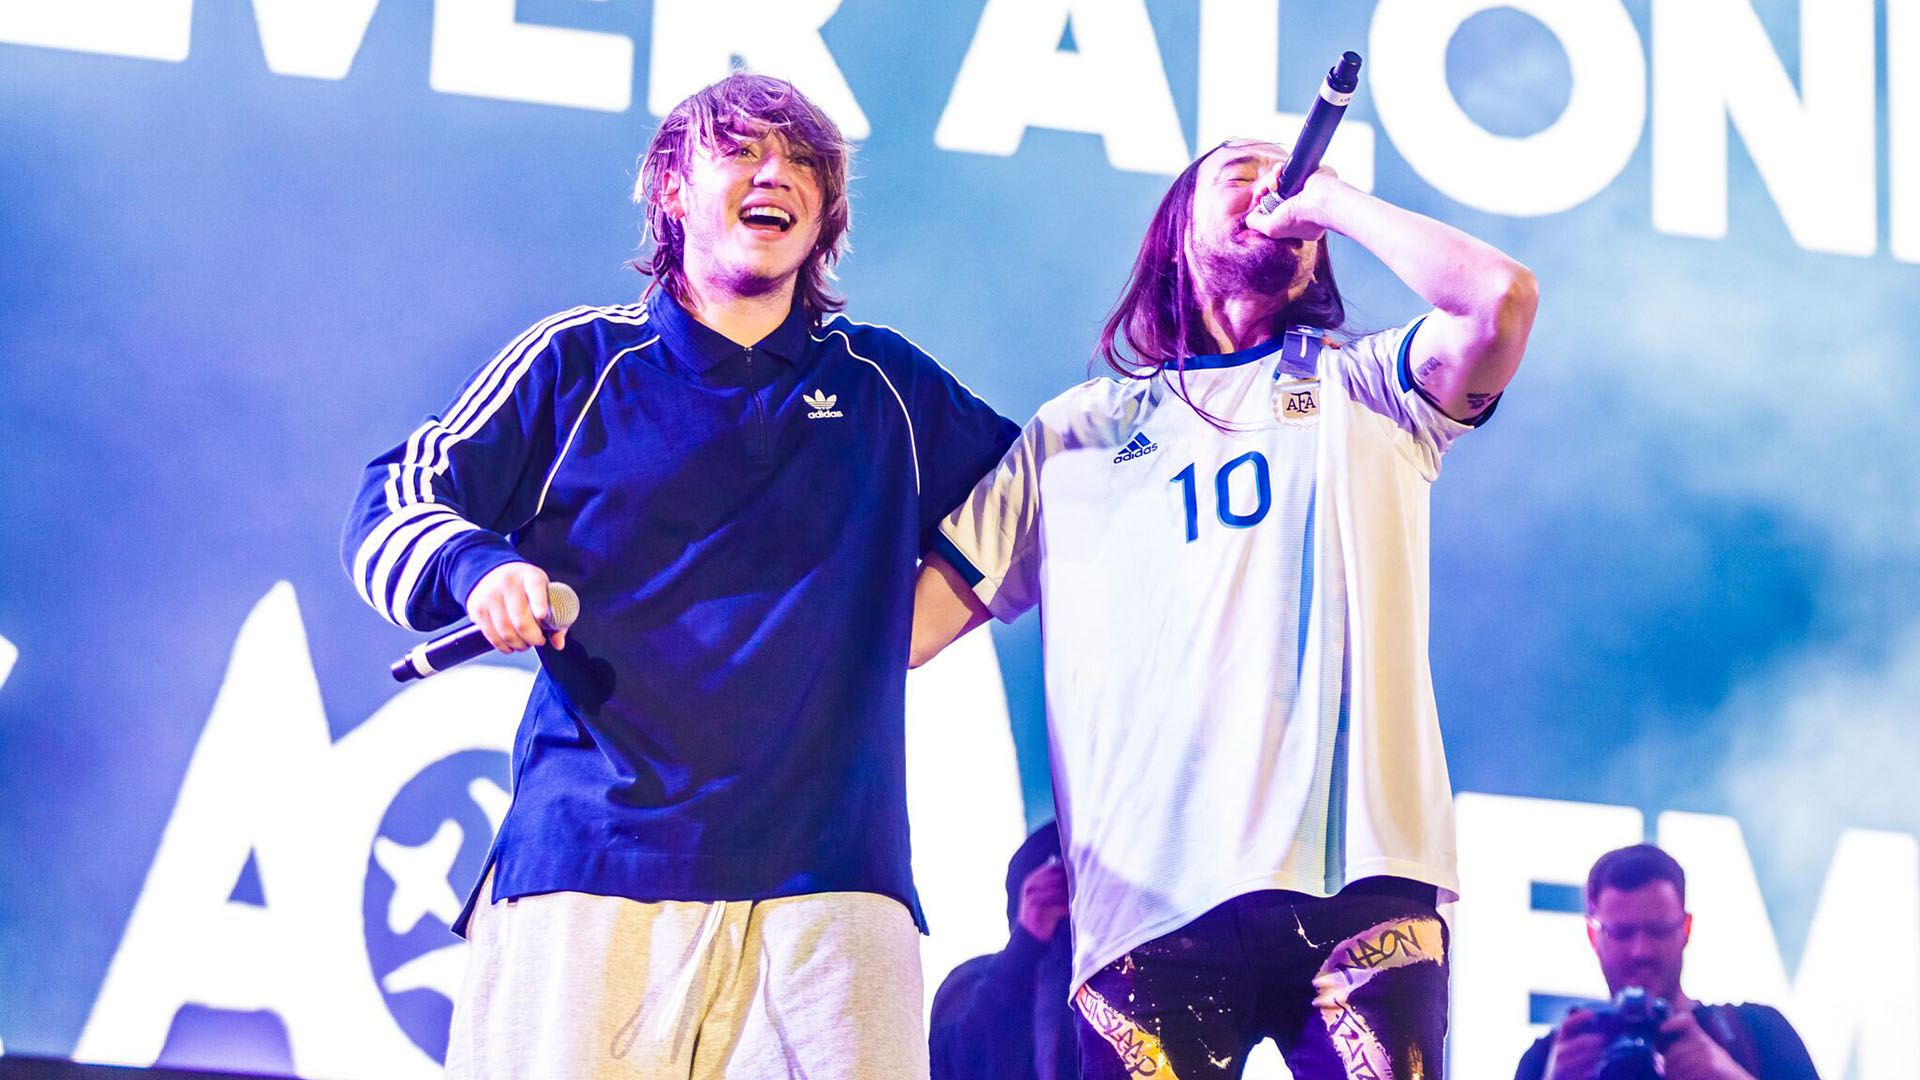 Steve Aoki subió al escenario para cantar junto a Paulo Londra (Foto: Lollapalooza)